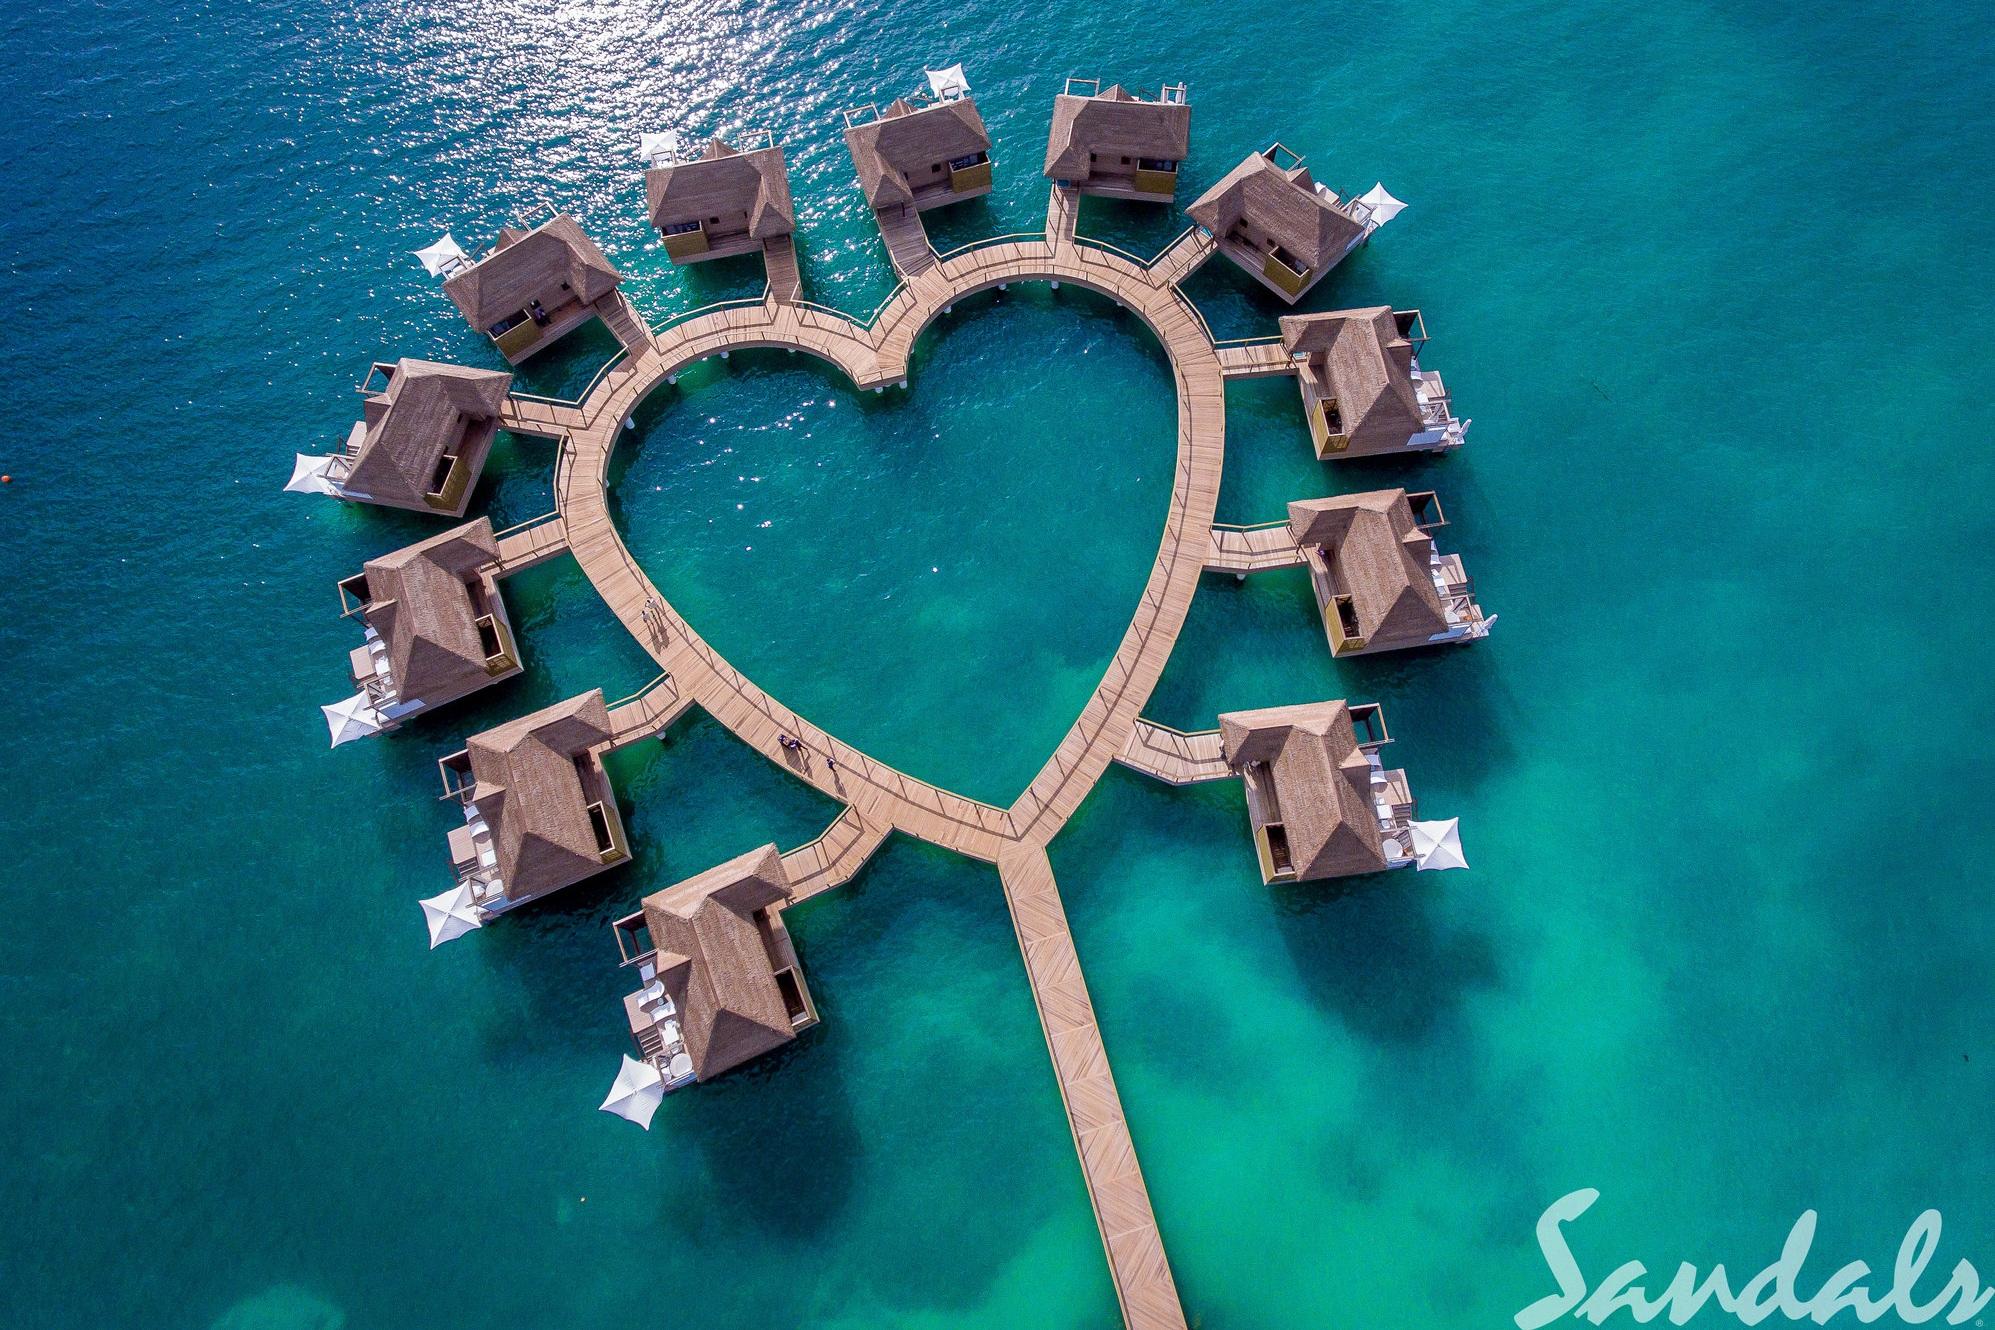 rsz_heart_shaped_bungalows.jpg